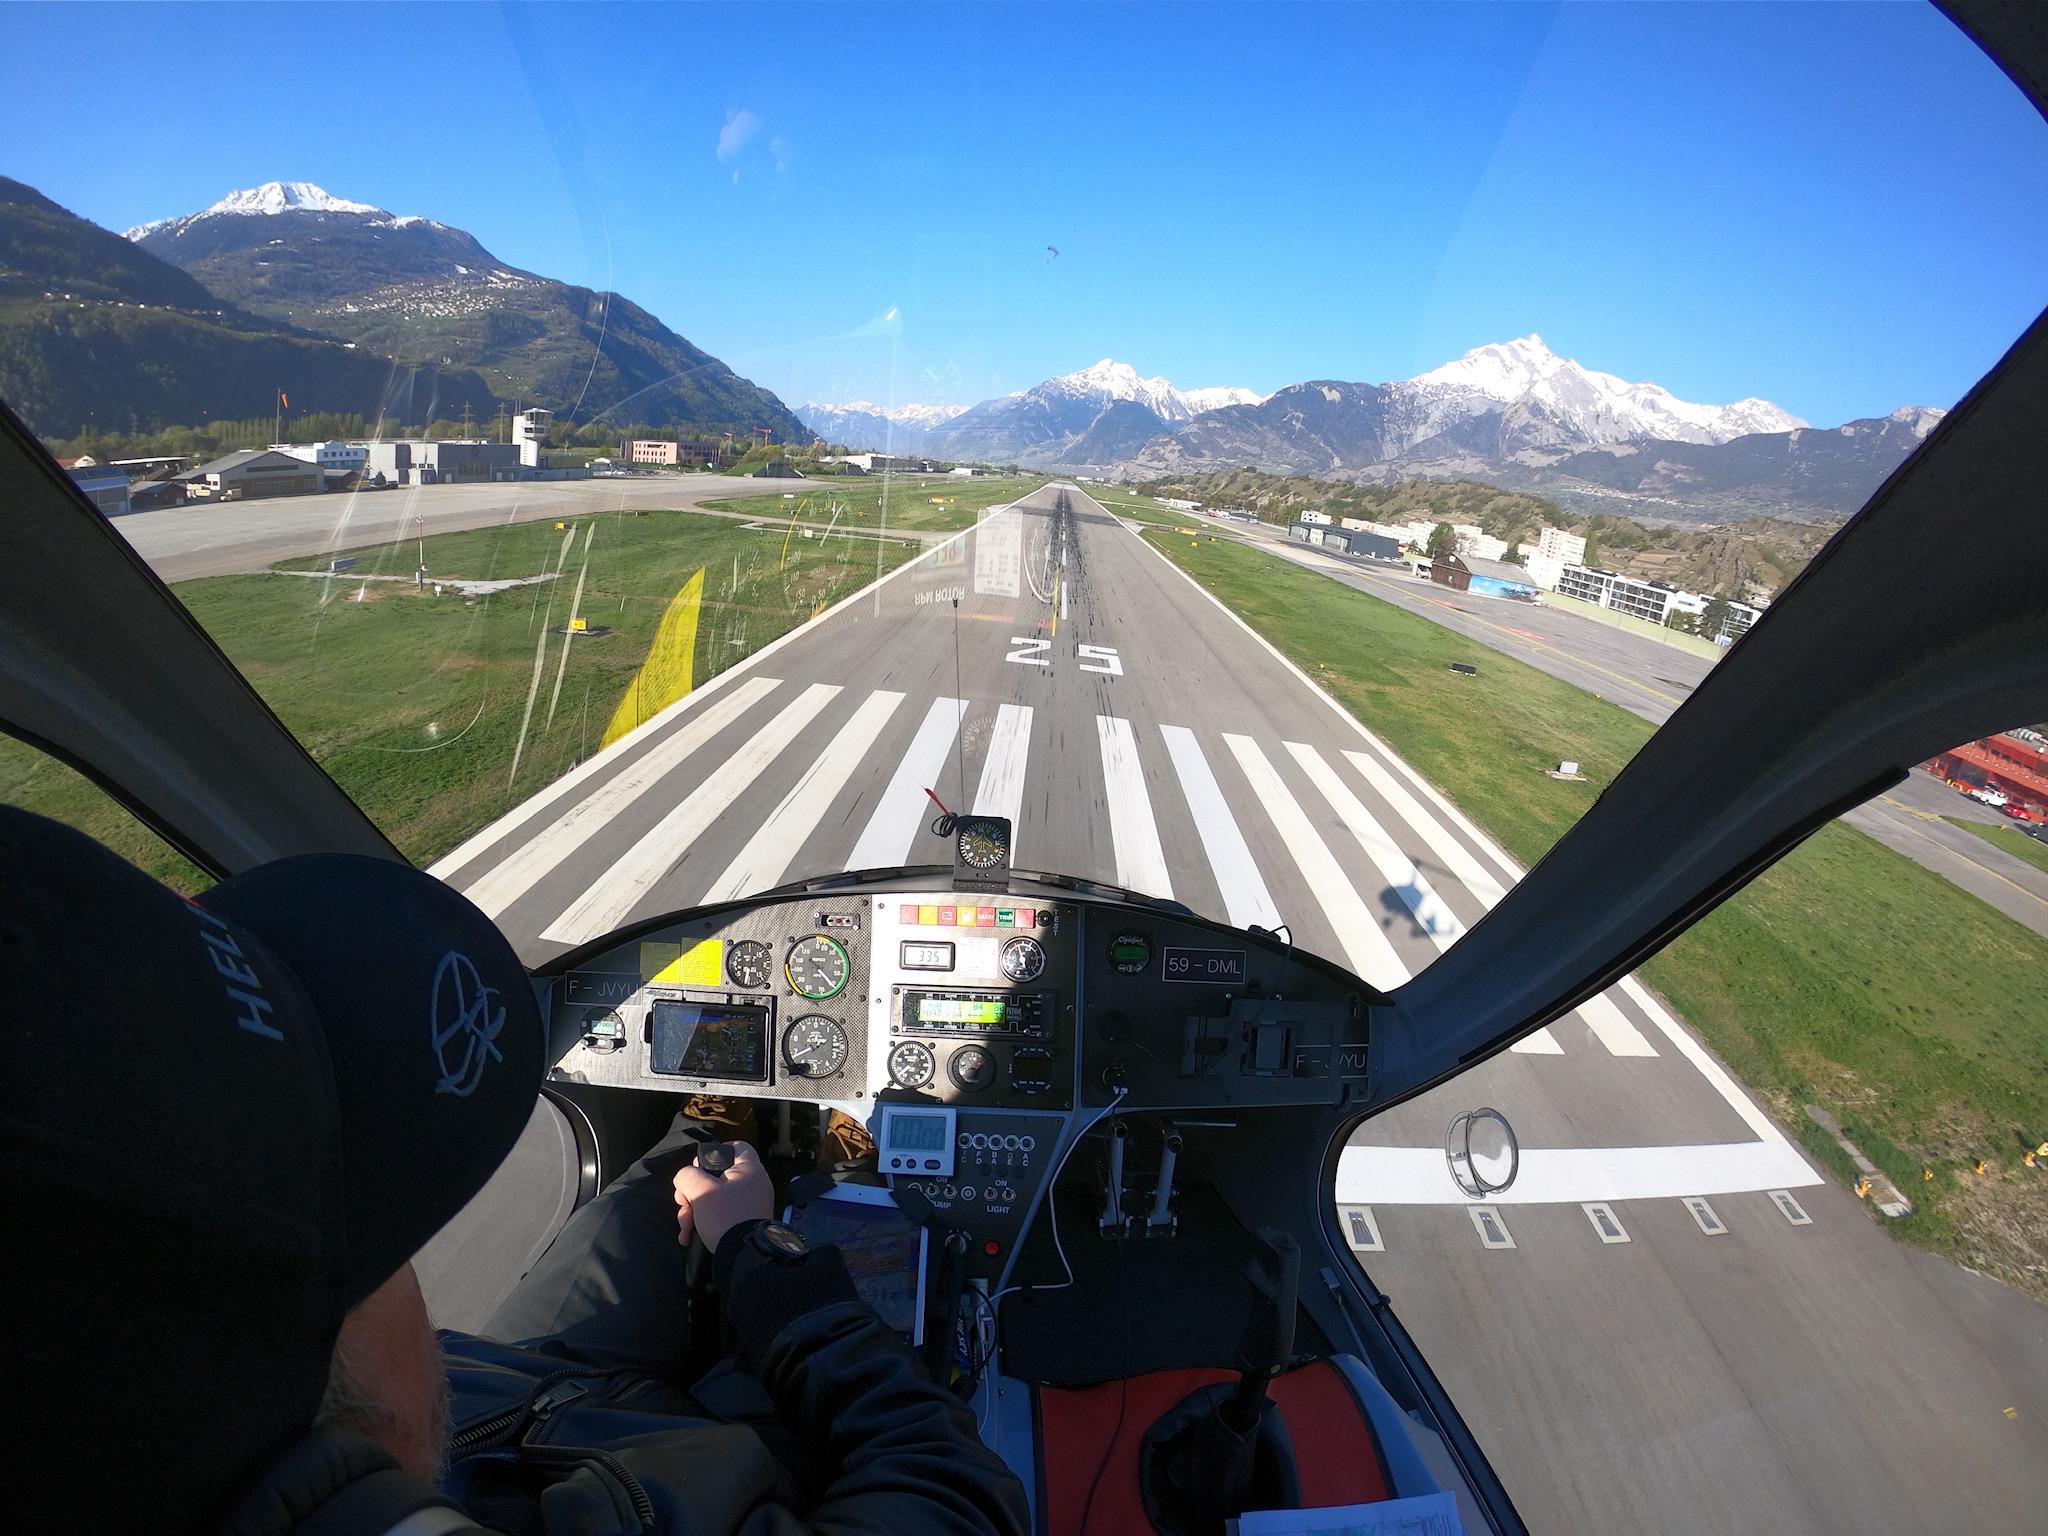 A flight over the 4 Valleys in Switzerland